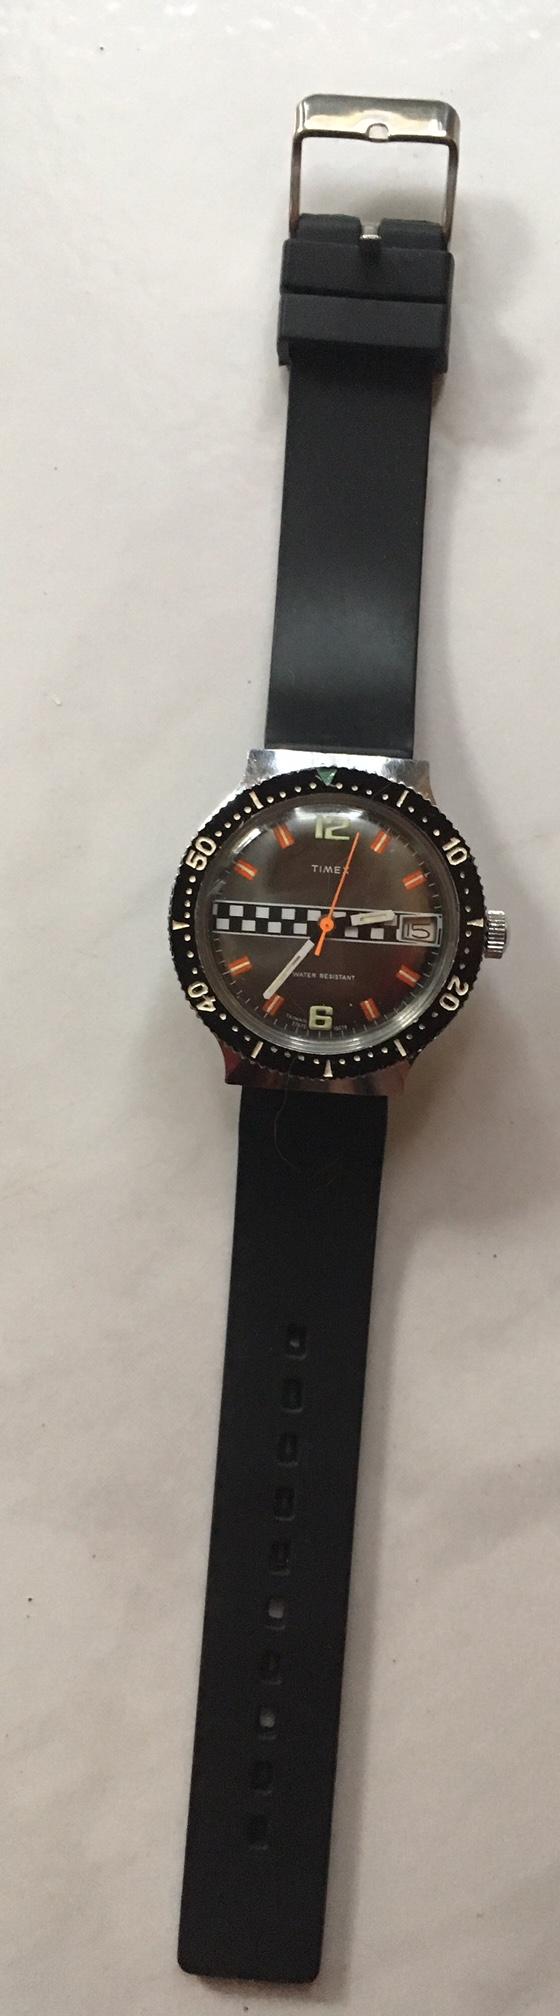 Timex Racing Stripes1